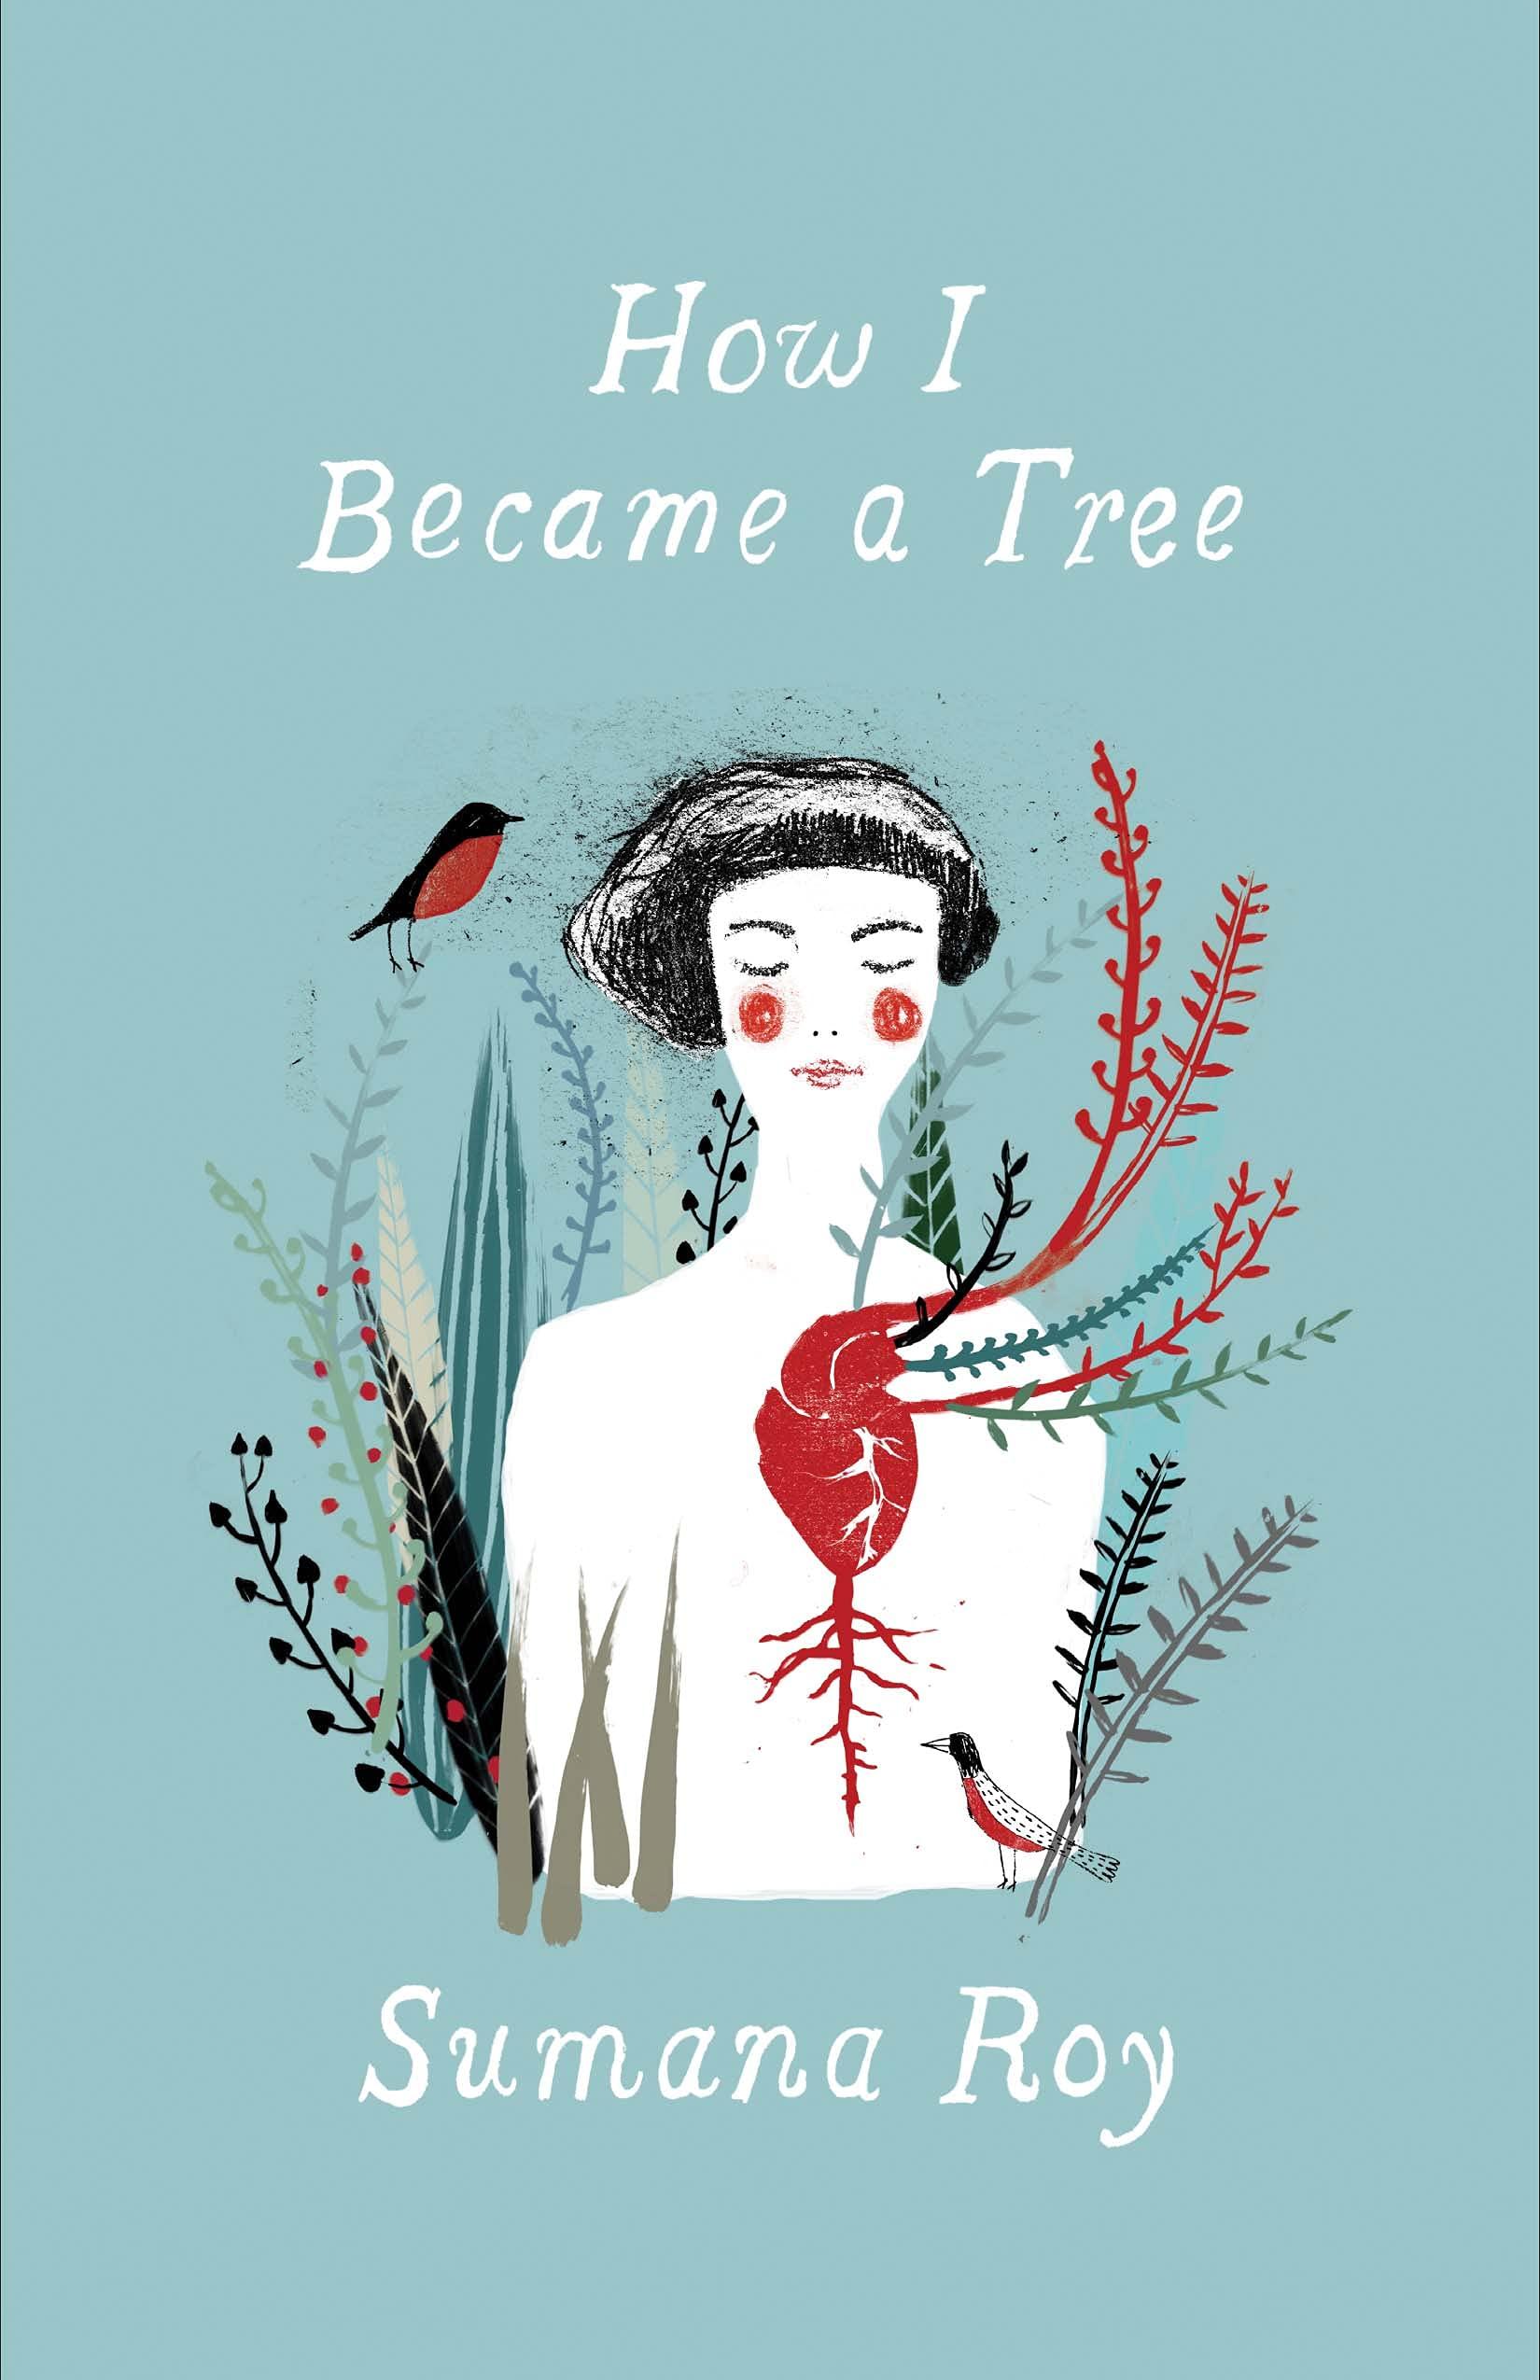 Sumana Roy, How I Became a Tree